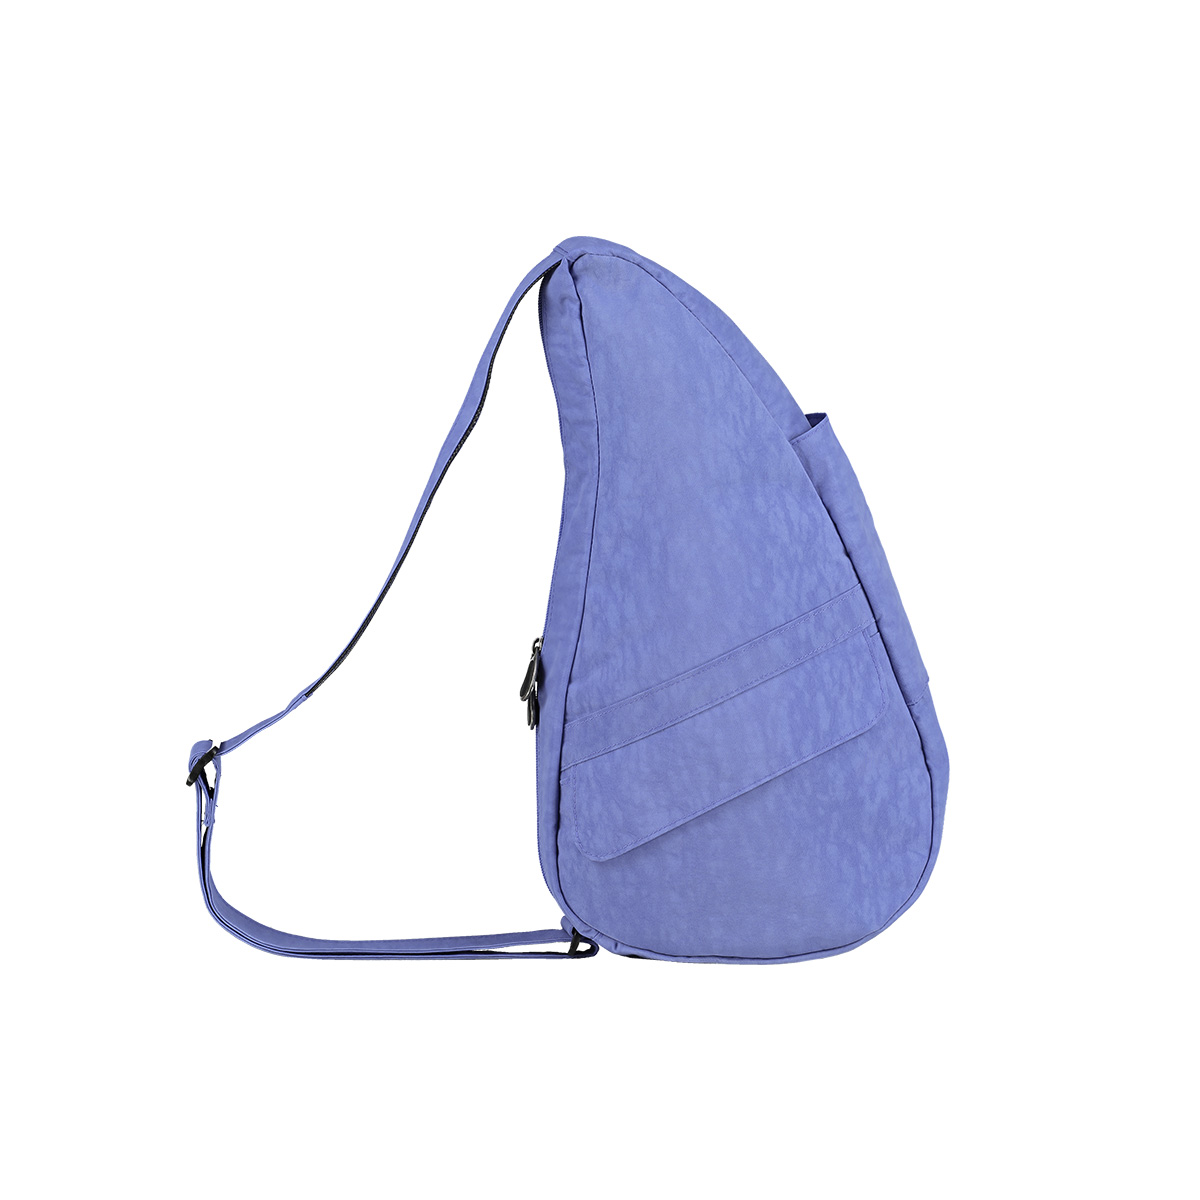 Healthy Back Bag/ヘルシーバックバッグ/ショルダーバッグ/ボディバッグ/旅行バッグ/軽量/レディース/メンズ 《限定ポーチ付》 公式ストア ヘルシーバックバッグ テクスチャードナイロン Sサイズ アイリス